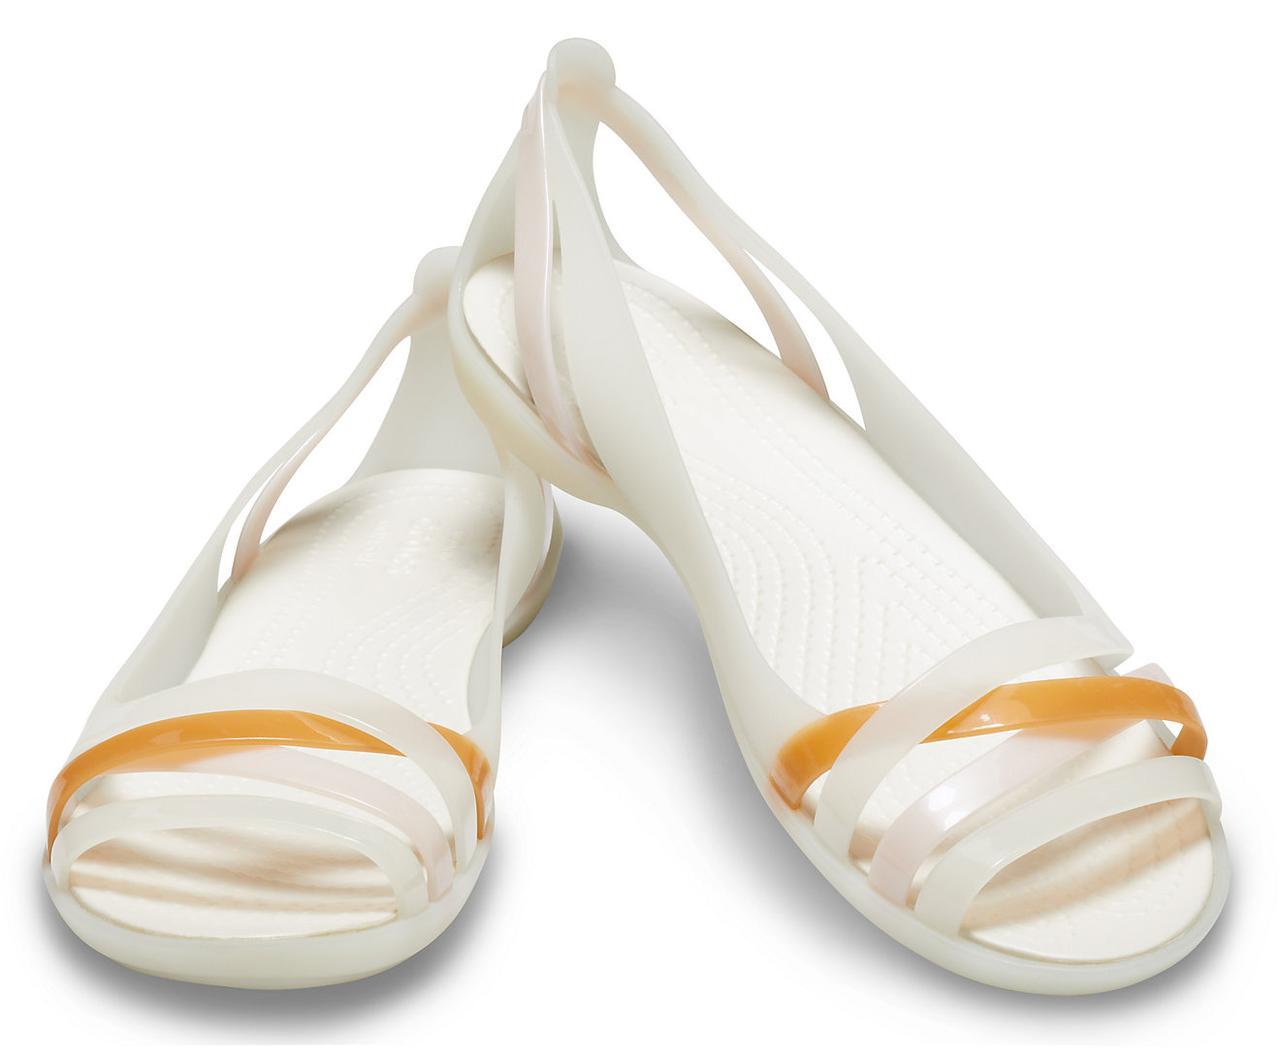 Босоножки женские балетки Кроксы Изабелла Хьюарэч оригинал / Crocs Women's Isabella Huarache II Flat